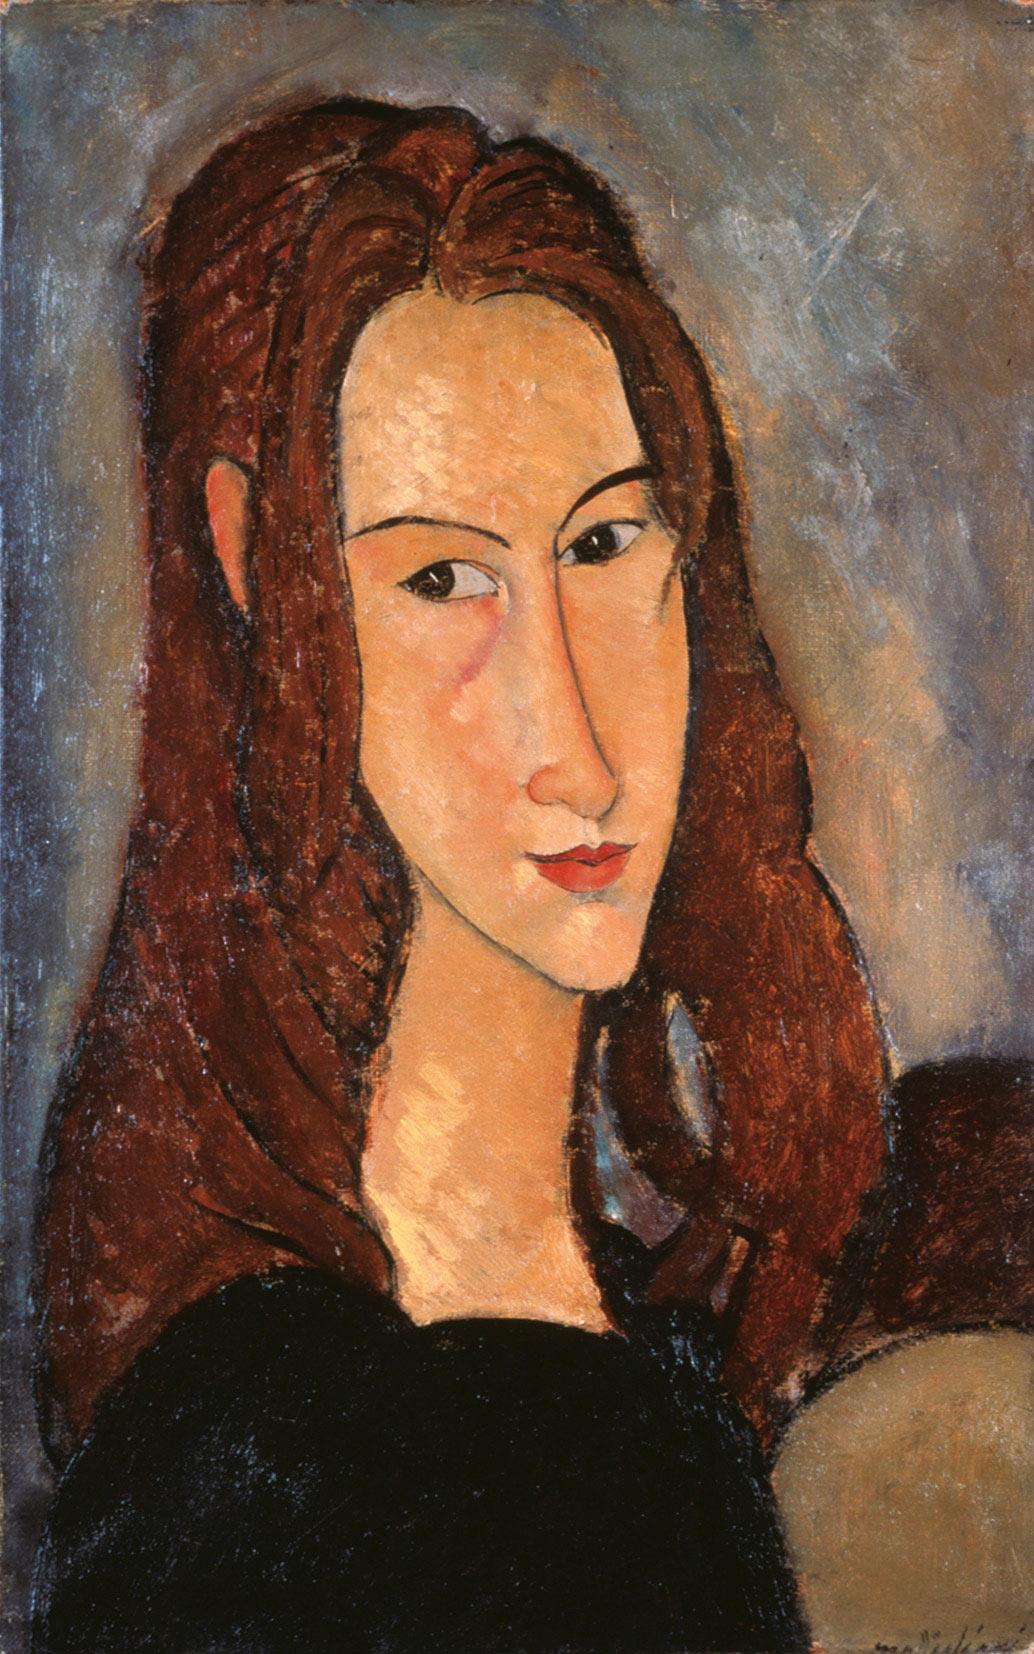 Amedeo Modigliani, Jeune fille rousse (Jeanne Hébuterne) (1918; olio su tela, 46 x 29 cm; Collezione Jonas Netter)